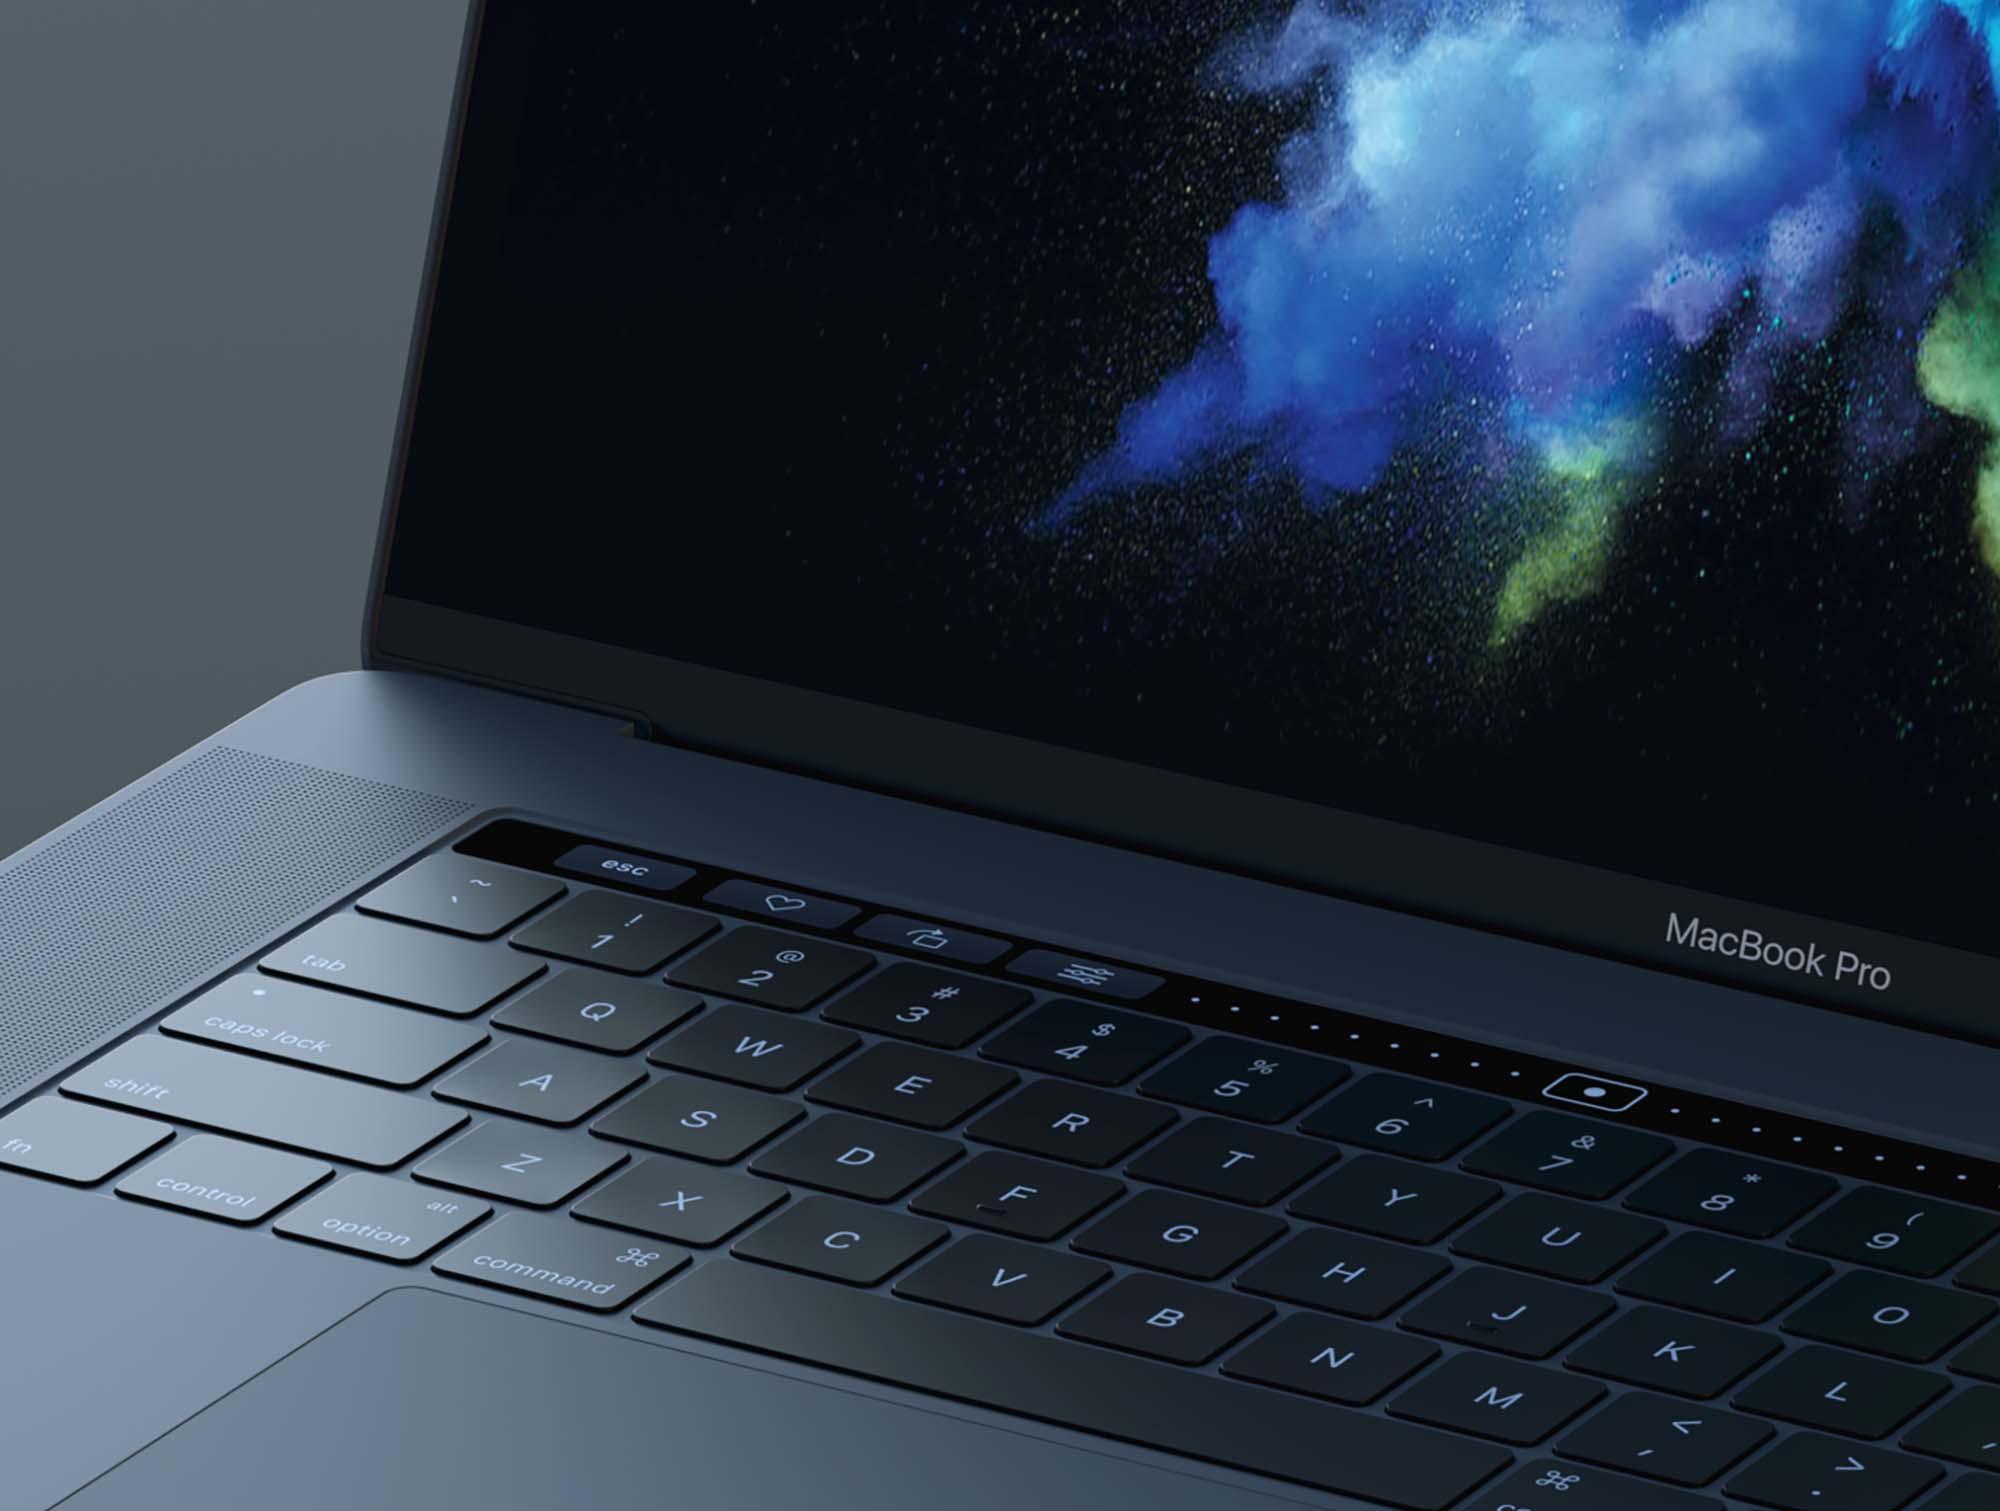 Macbook Pro Mockup 2